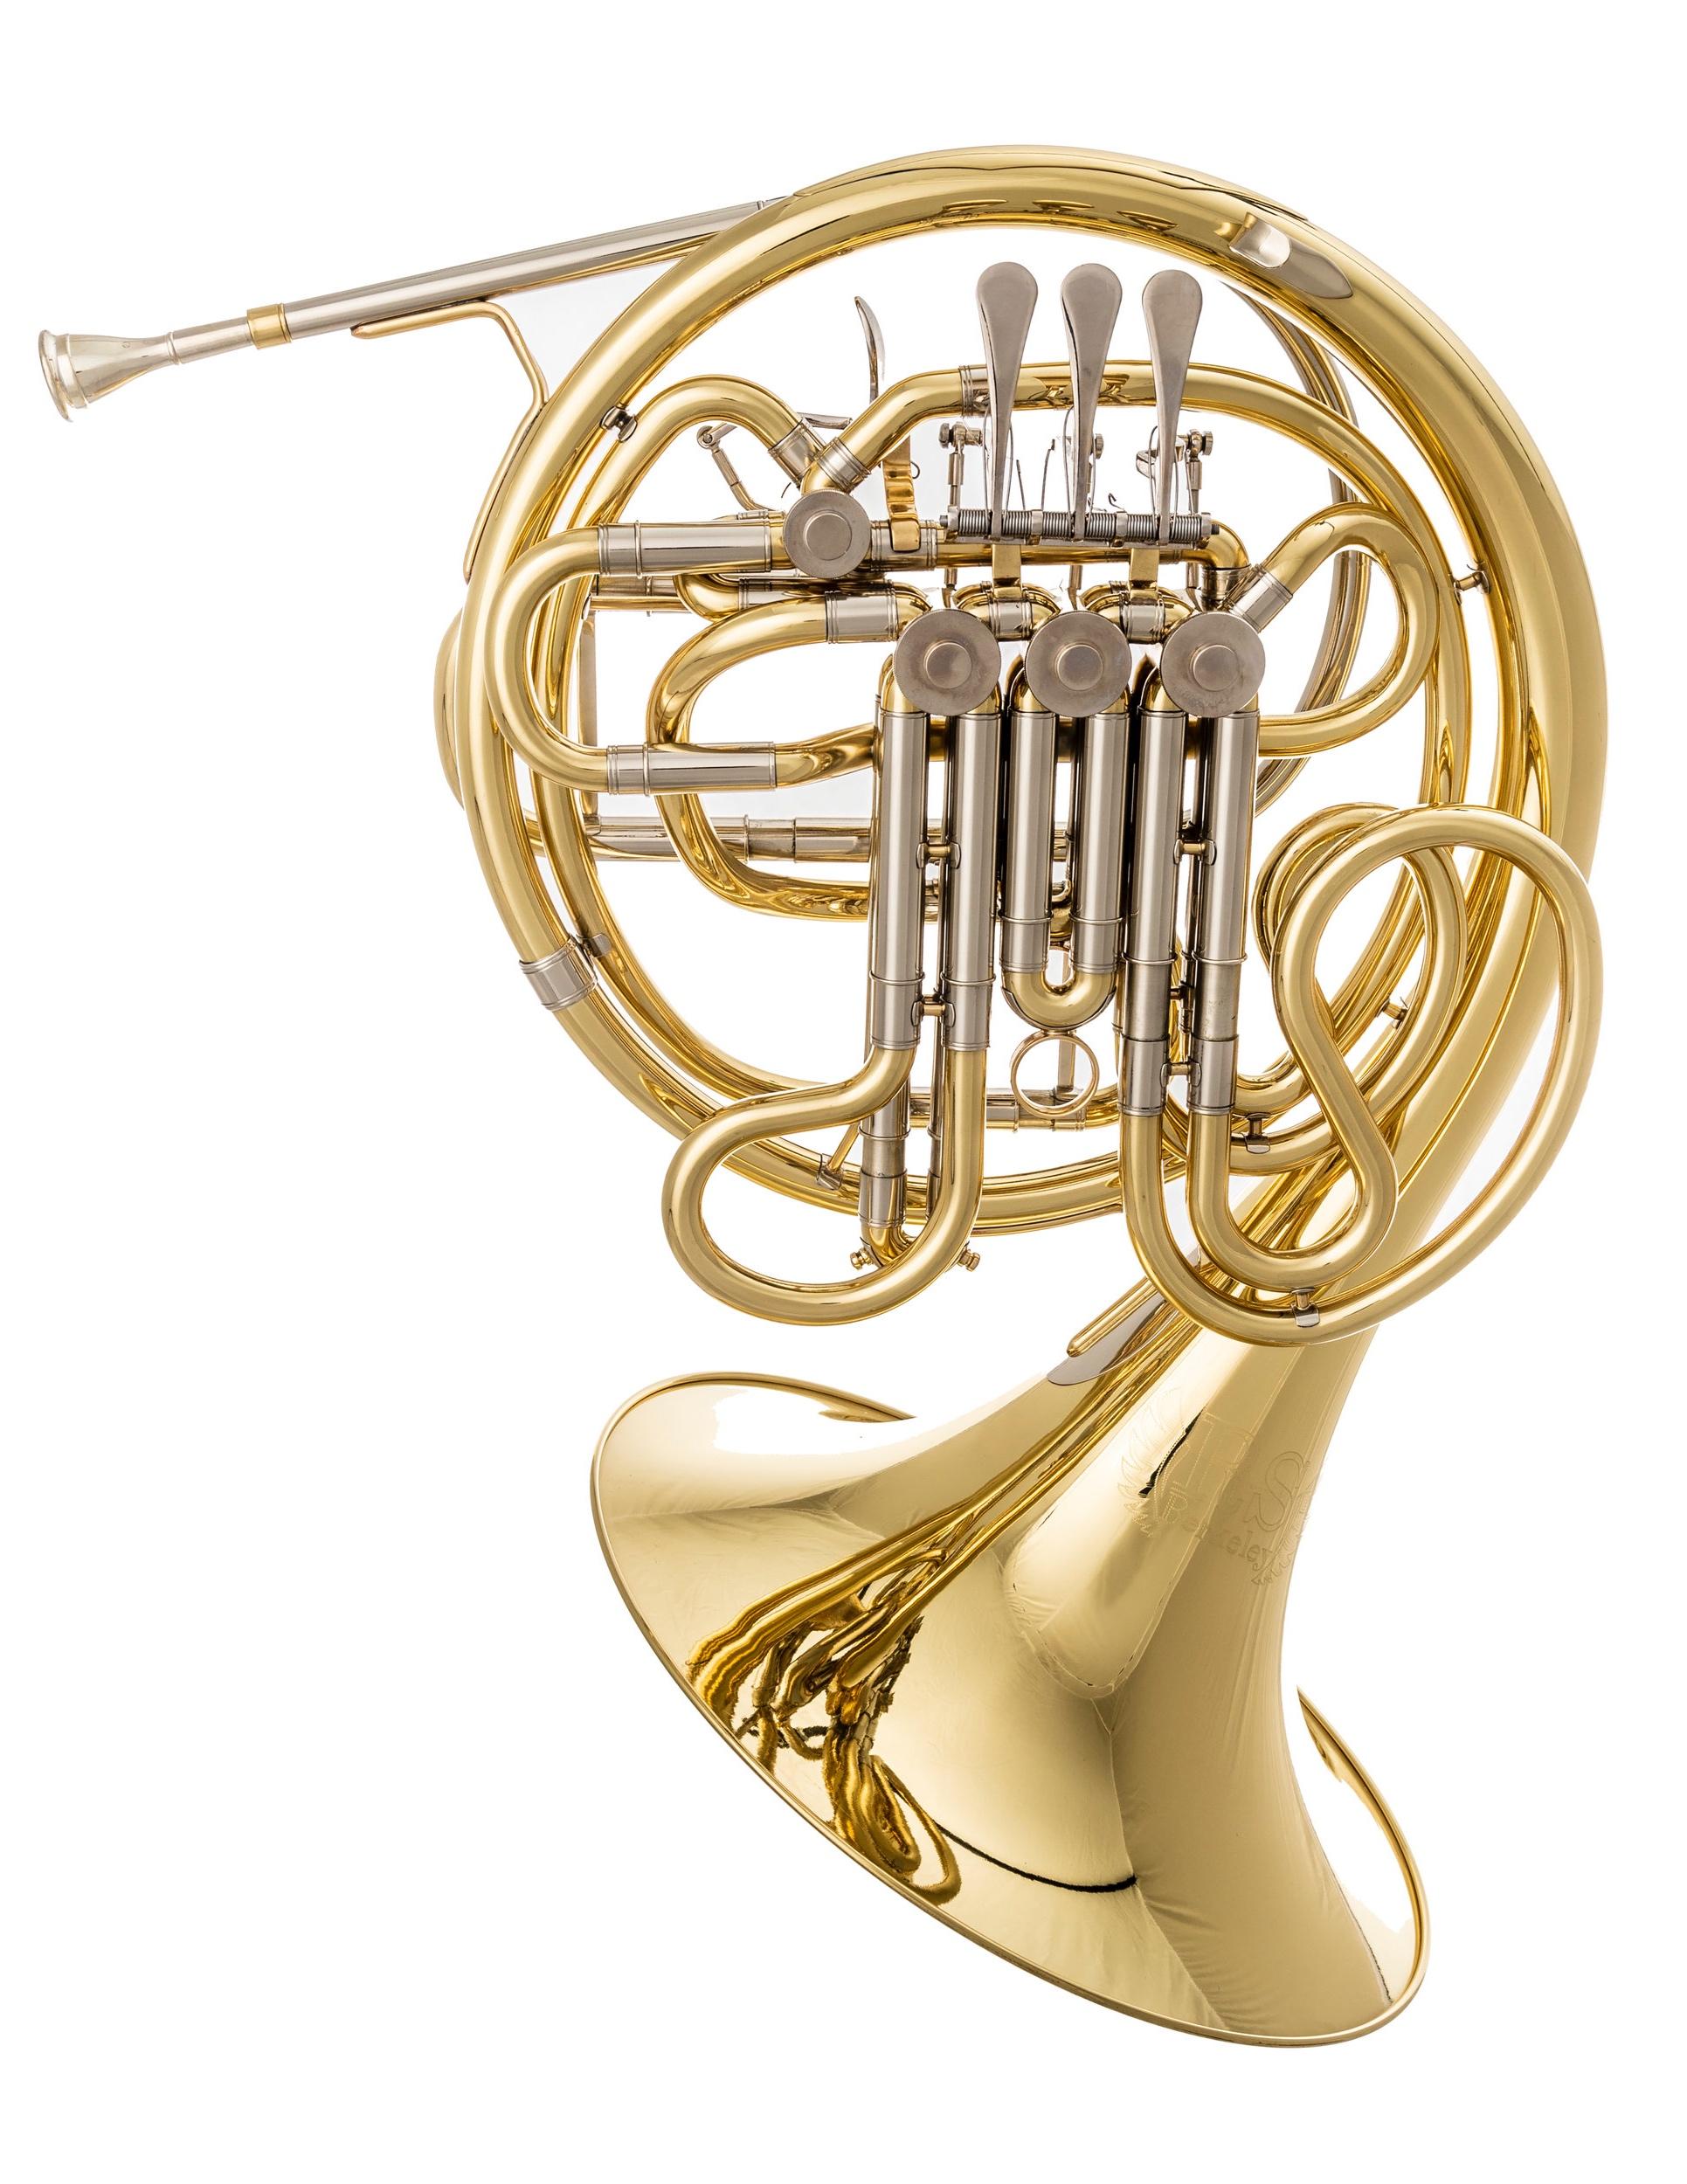 FR812+Double+French+Horn+0002.jpg